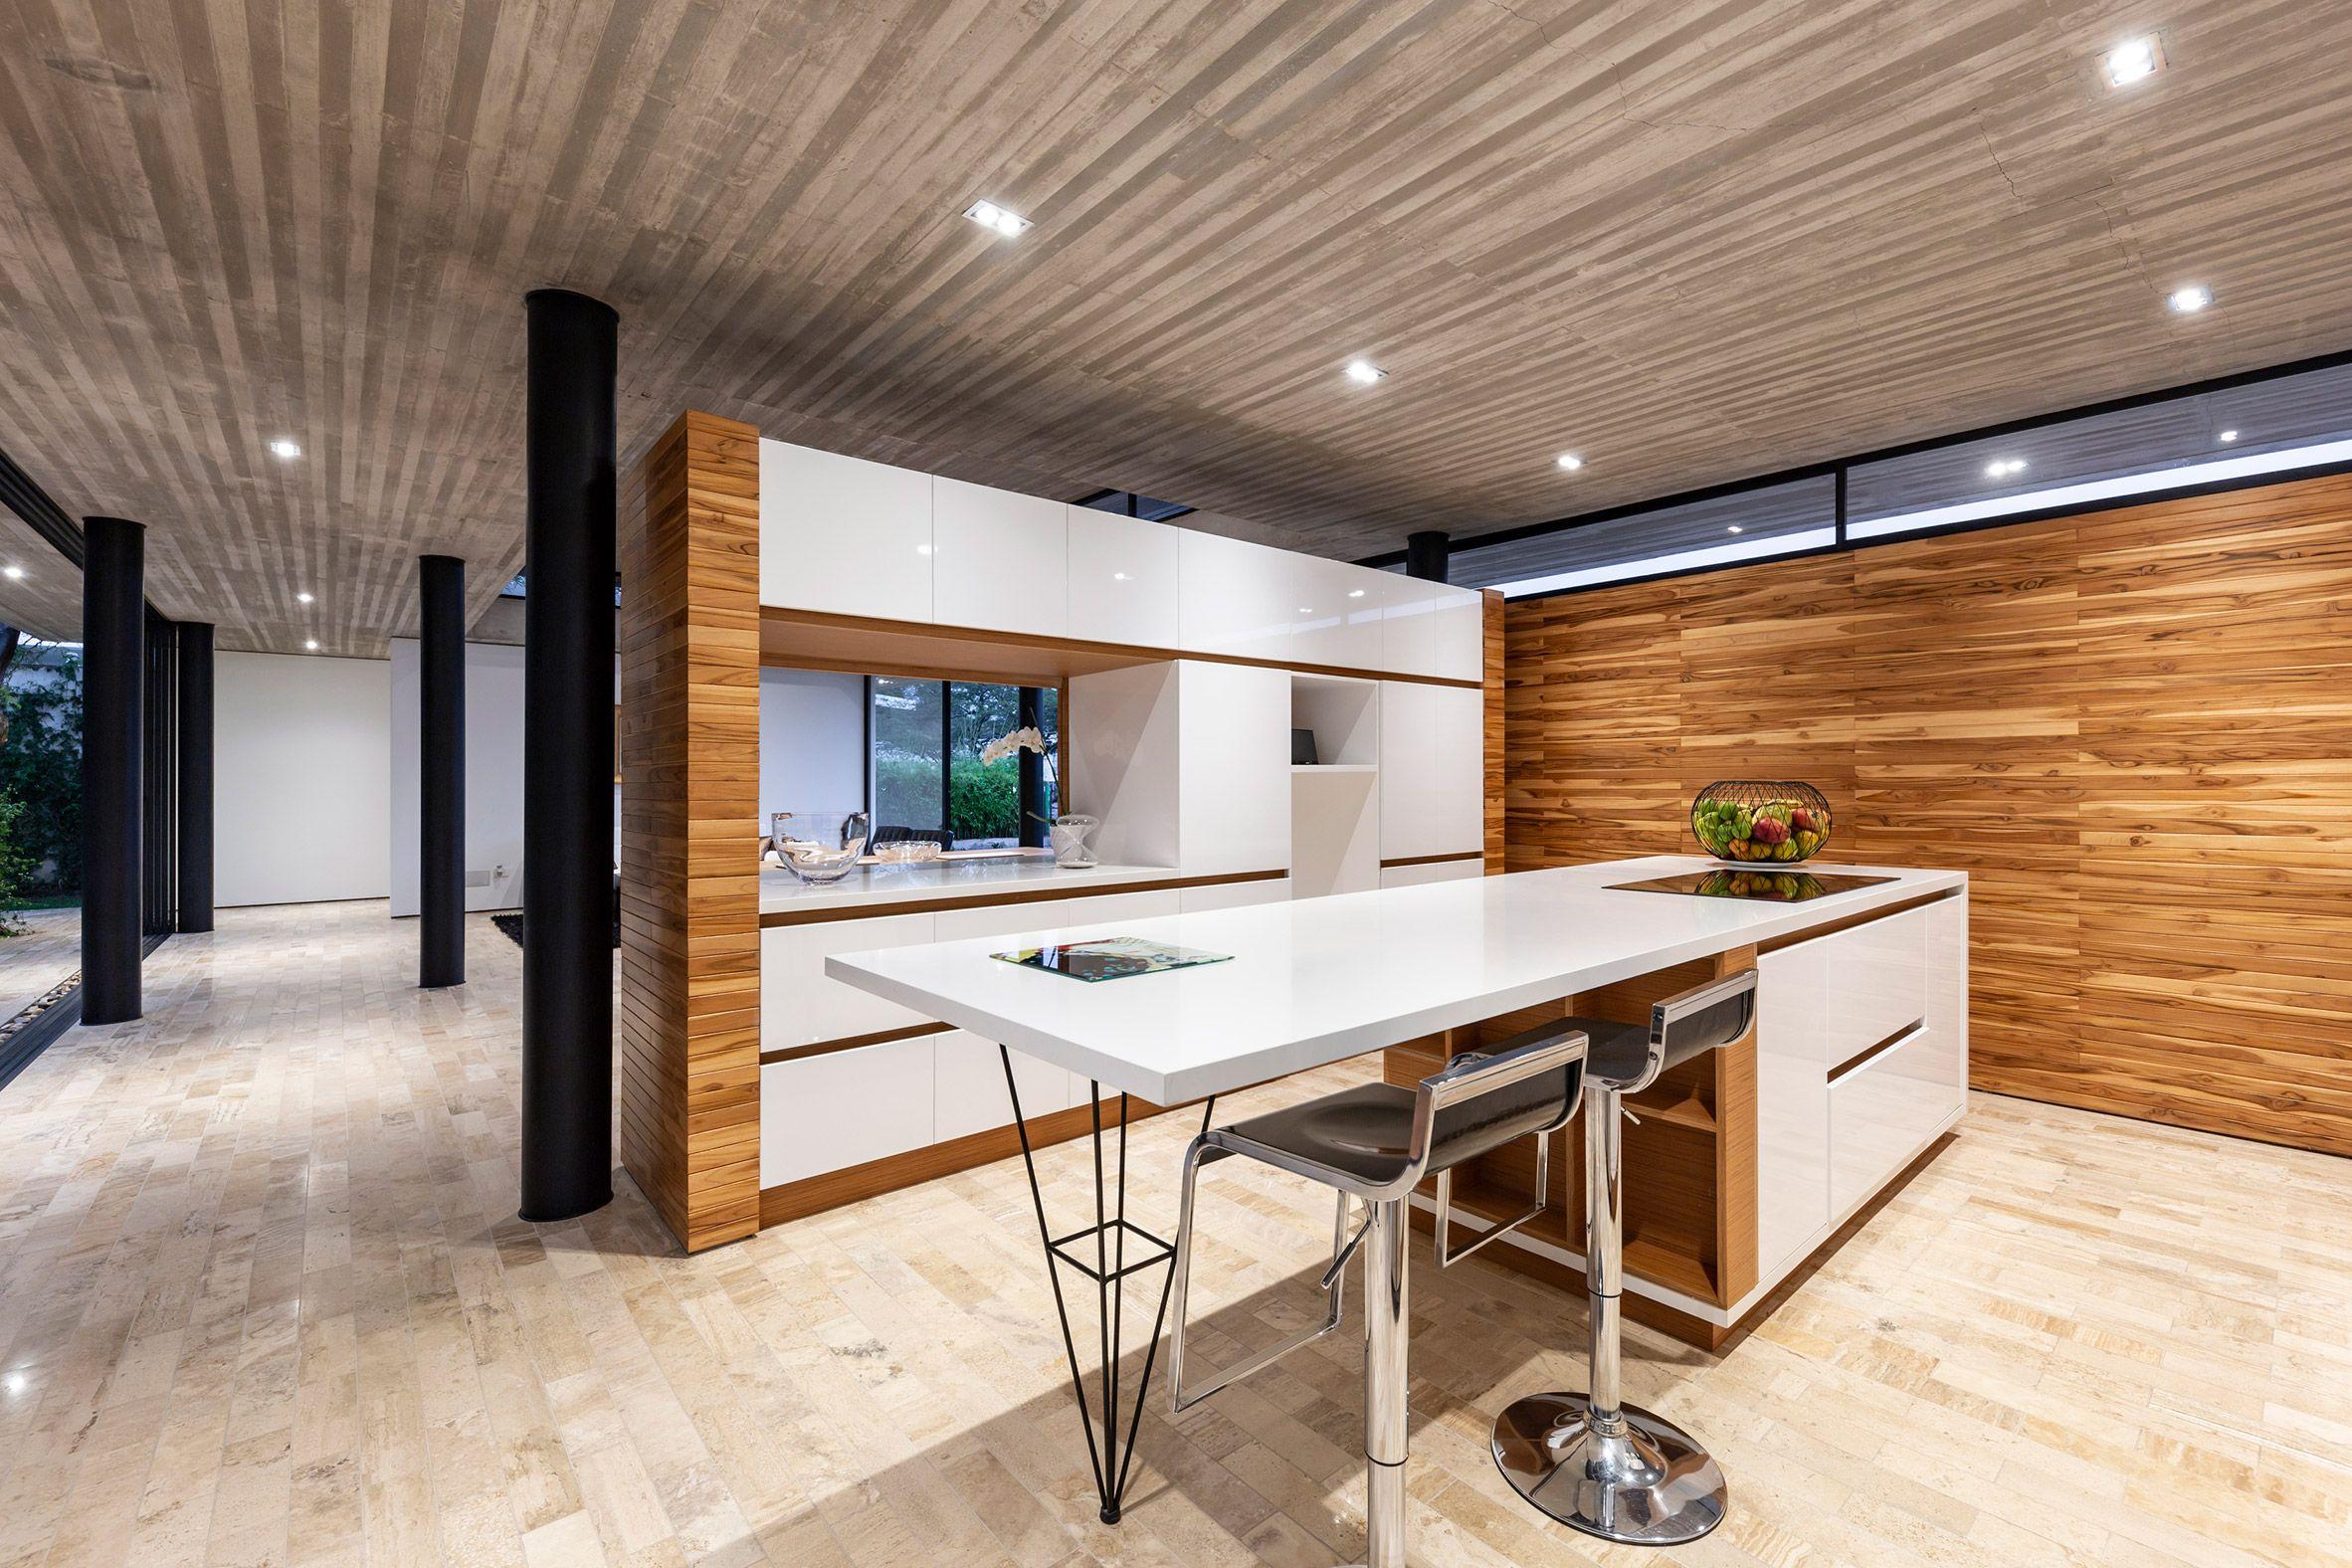 Tacuri House By Gabriel Rivera Modern House Design House Design Contemporary Interior Design